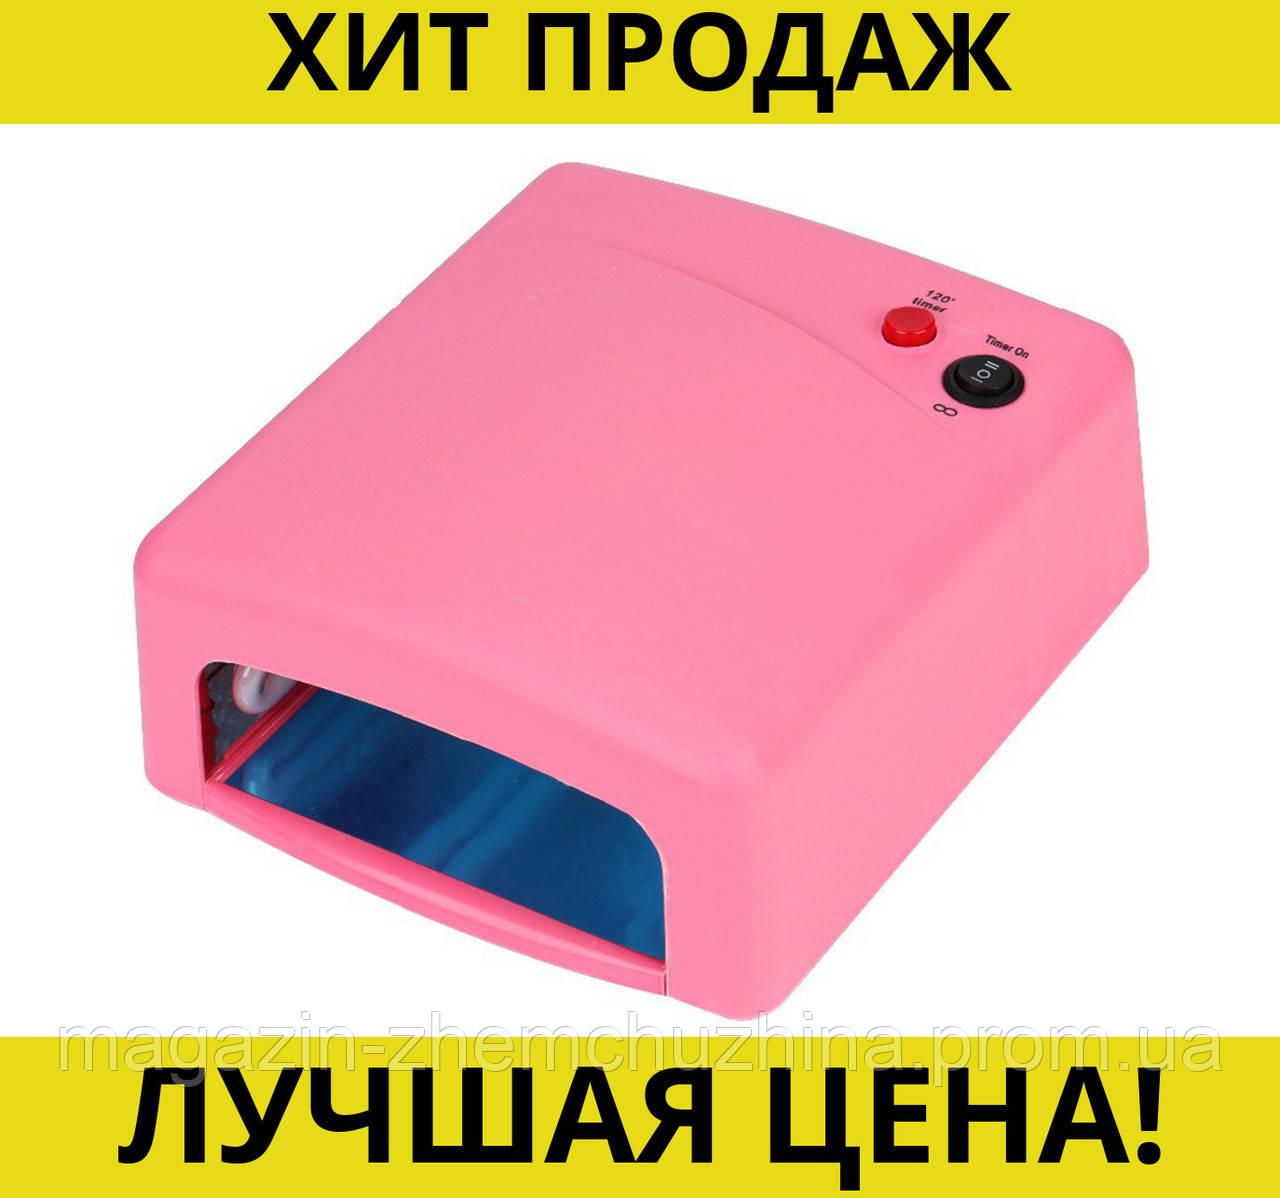 Sale! Ультрафиолетовая лампа для наращивания ногтей UV Lamp 36 Watt ZH-818